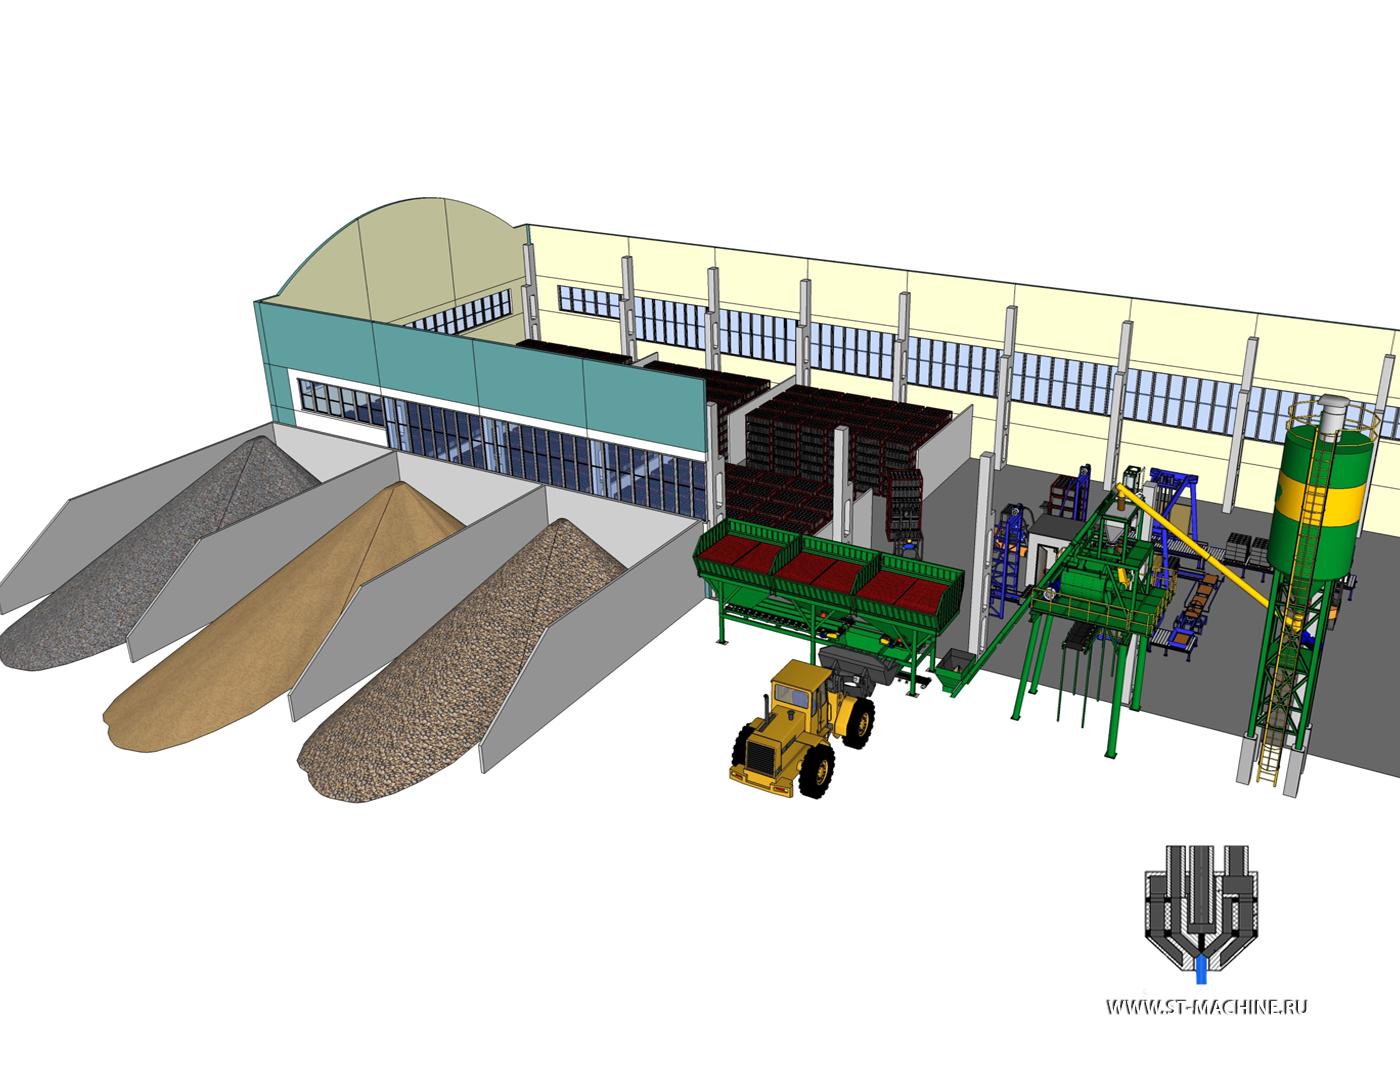 linii-vibropress-proekt-st-machine.ru-betonnui-zavod.jpg